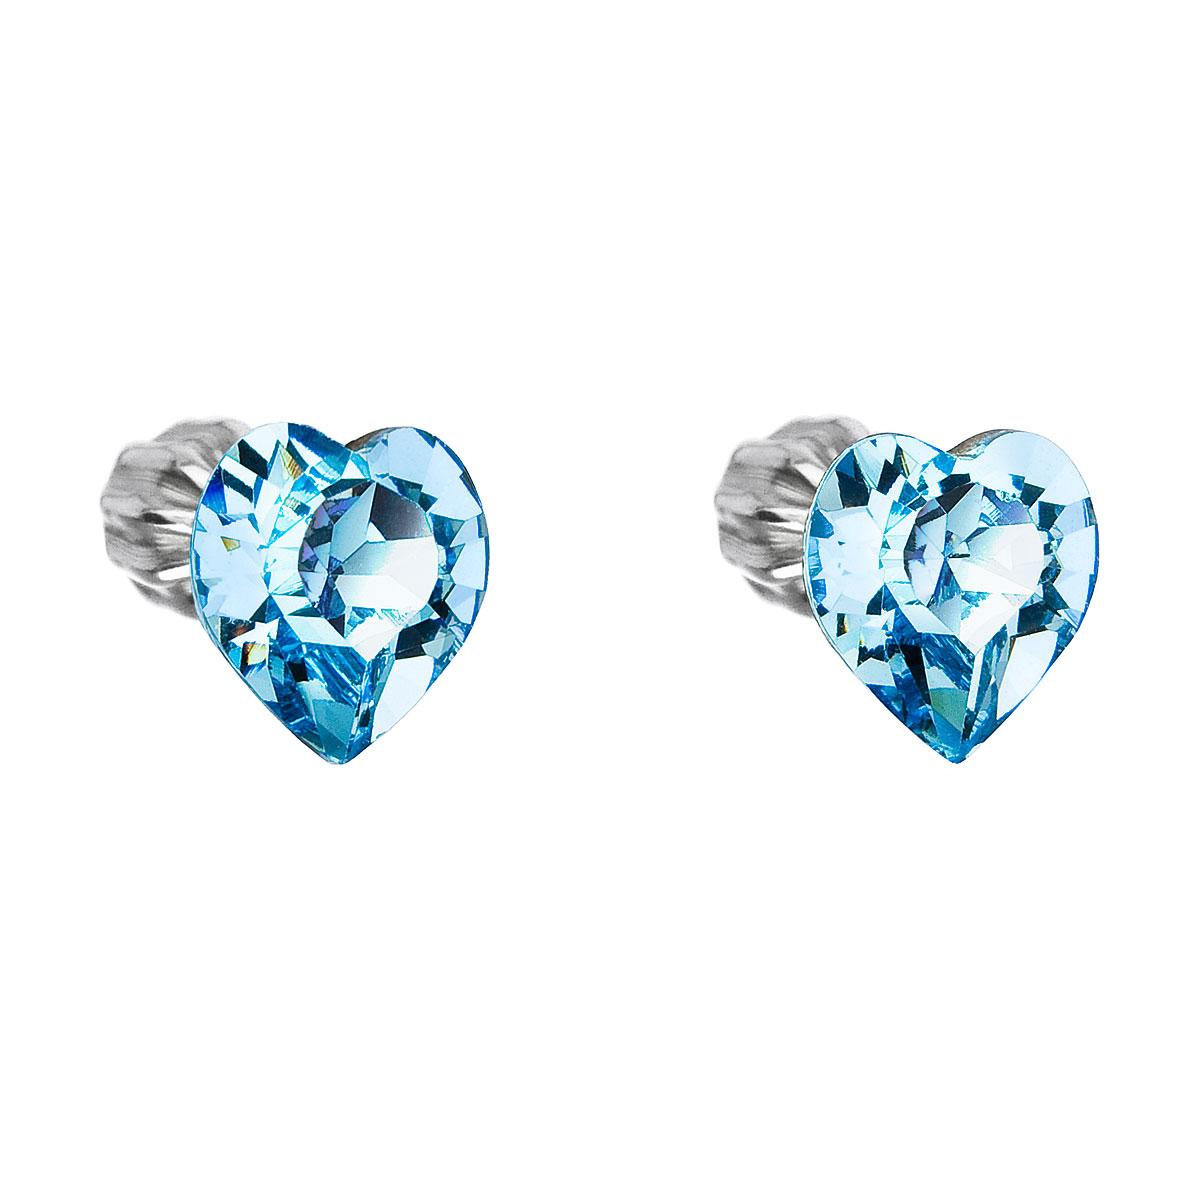 Strieborné náušnice kôstka s krištáľmi Swarovski modré srdce 31139.3